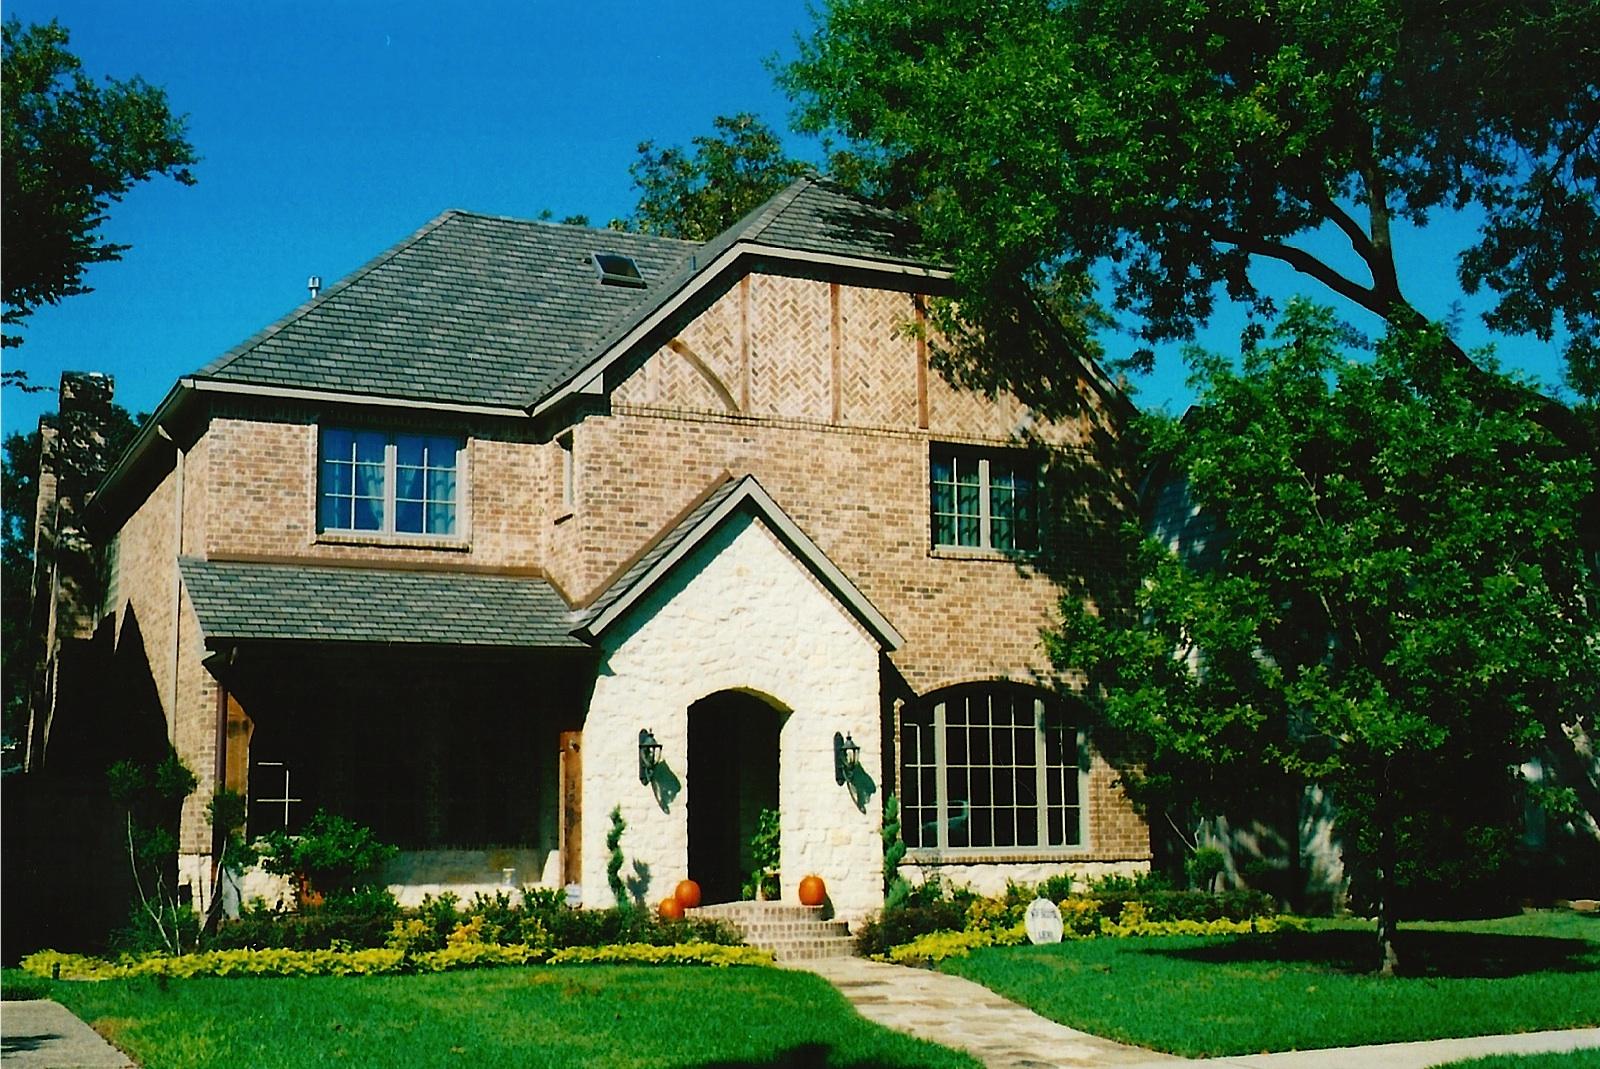 4065 Purdue Avenue University Park Texas 2884 Square Feet 1 Story English Cottage 150000 Renovation 2009